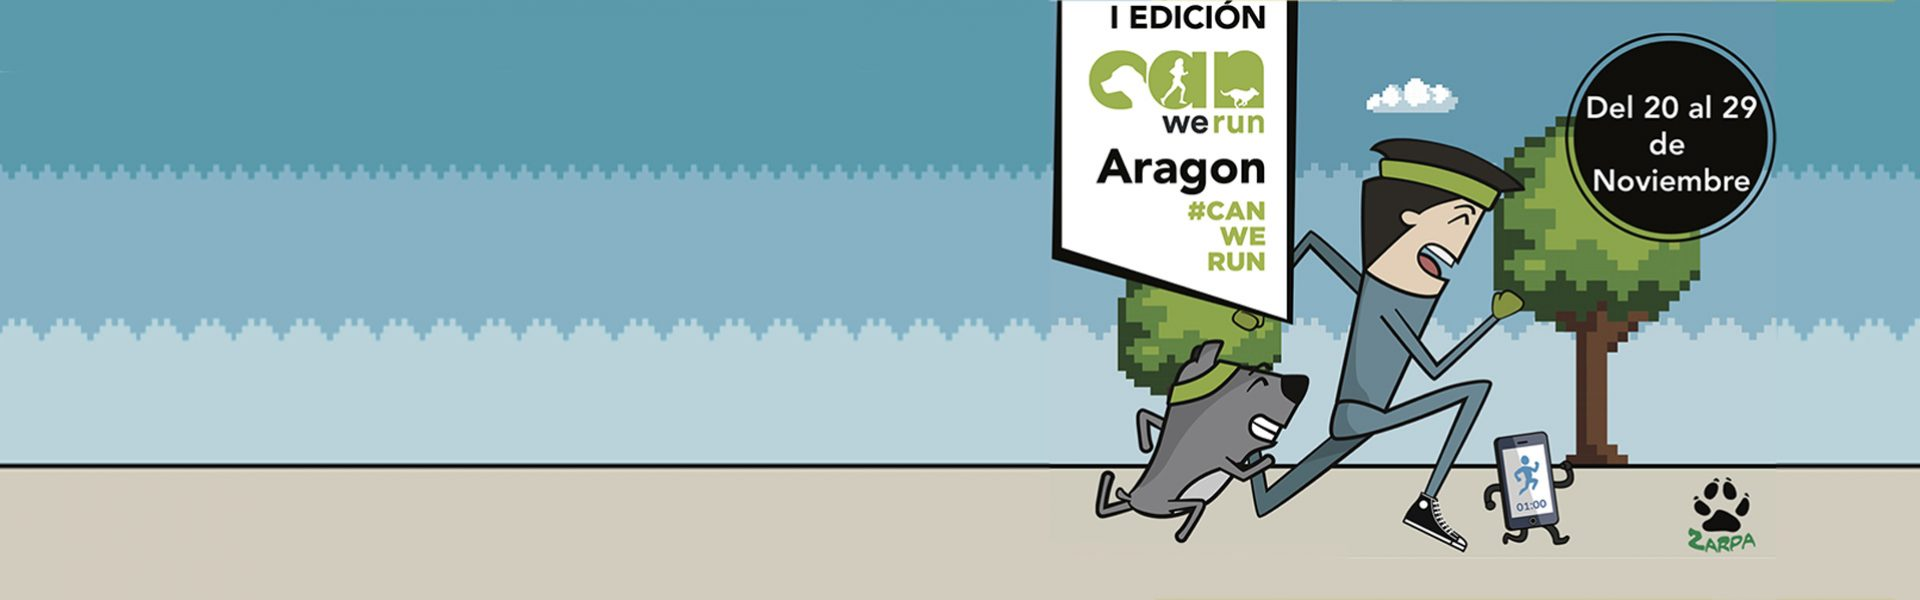 Can We Run Aragón